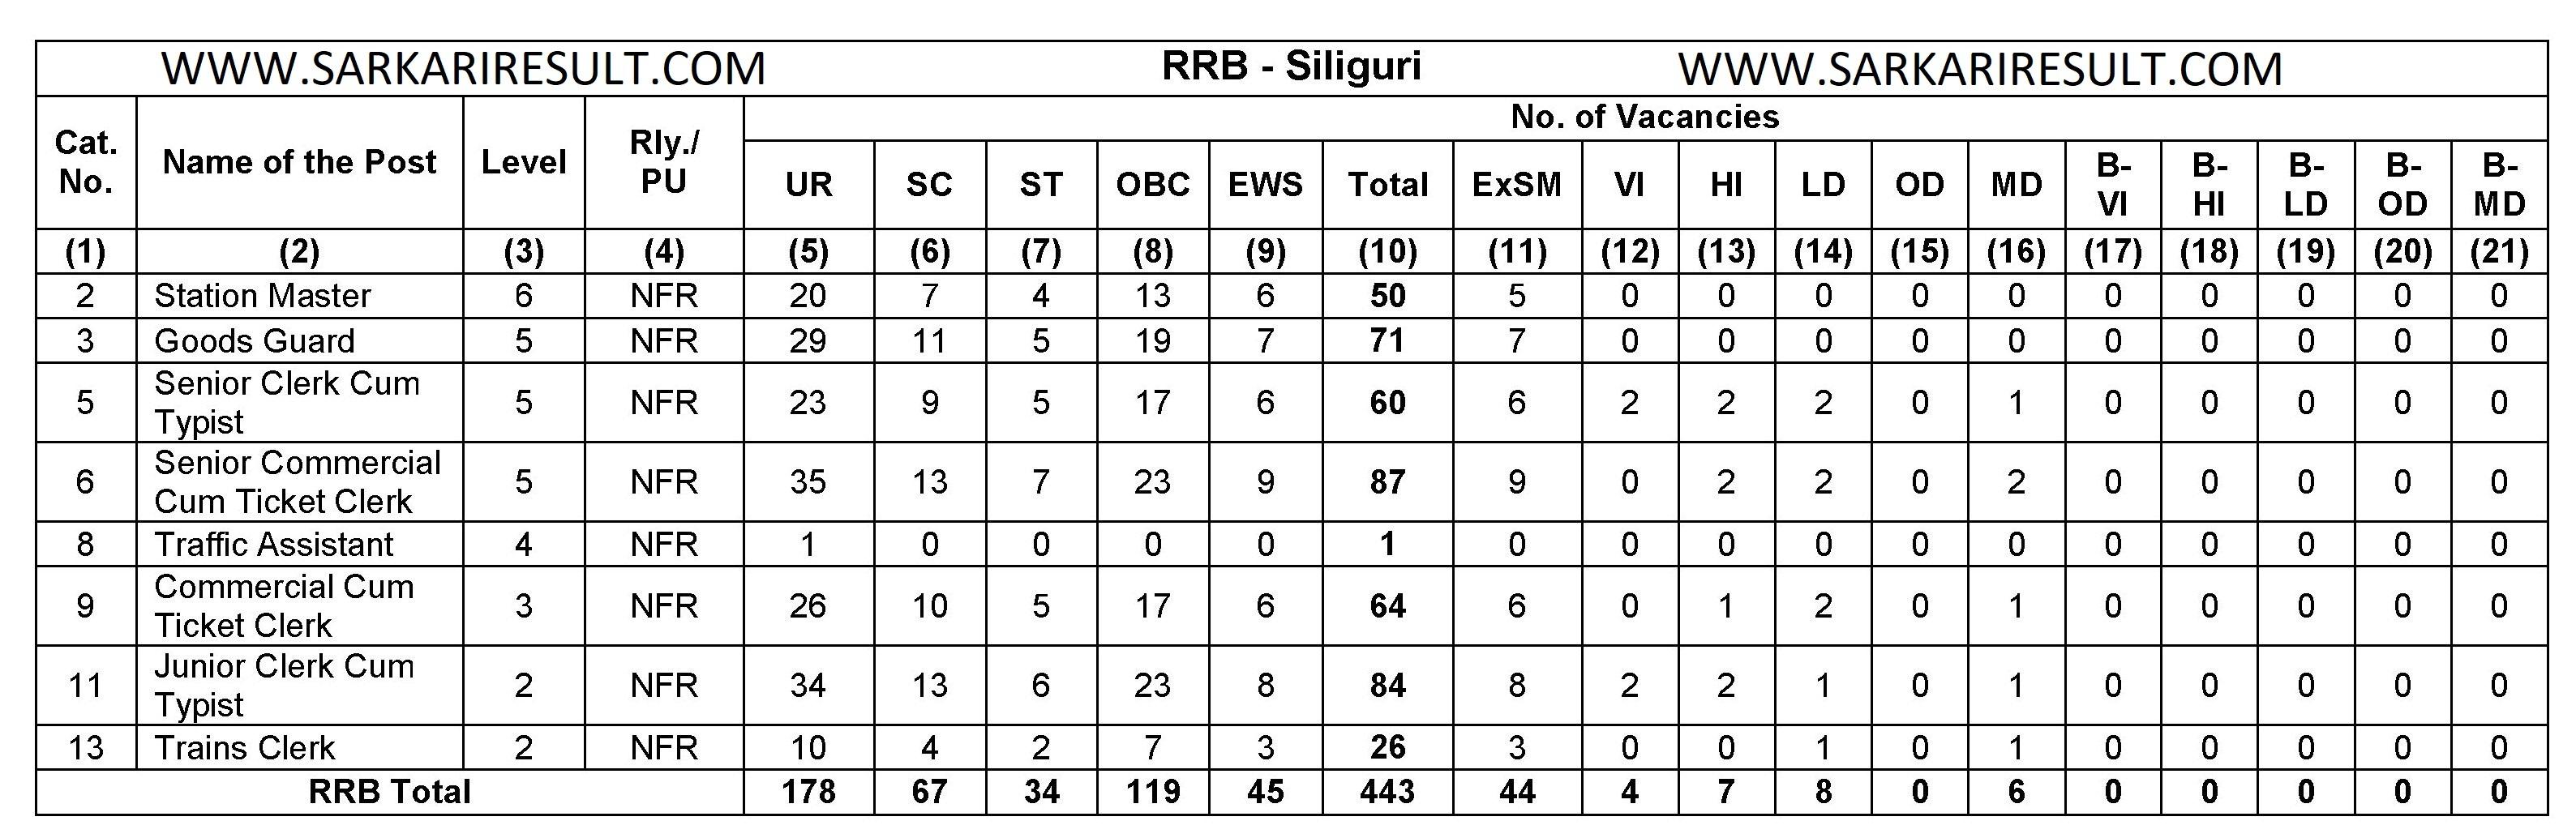 Ntpc exam date 2020 sarkari result